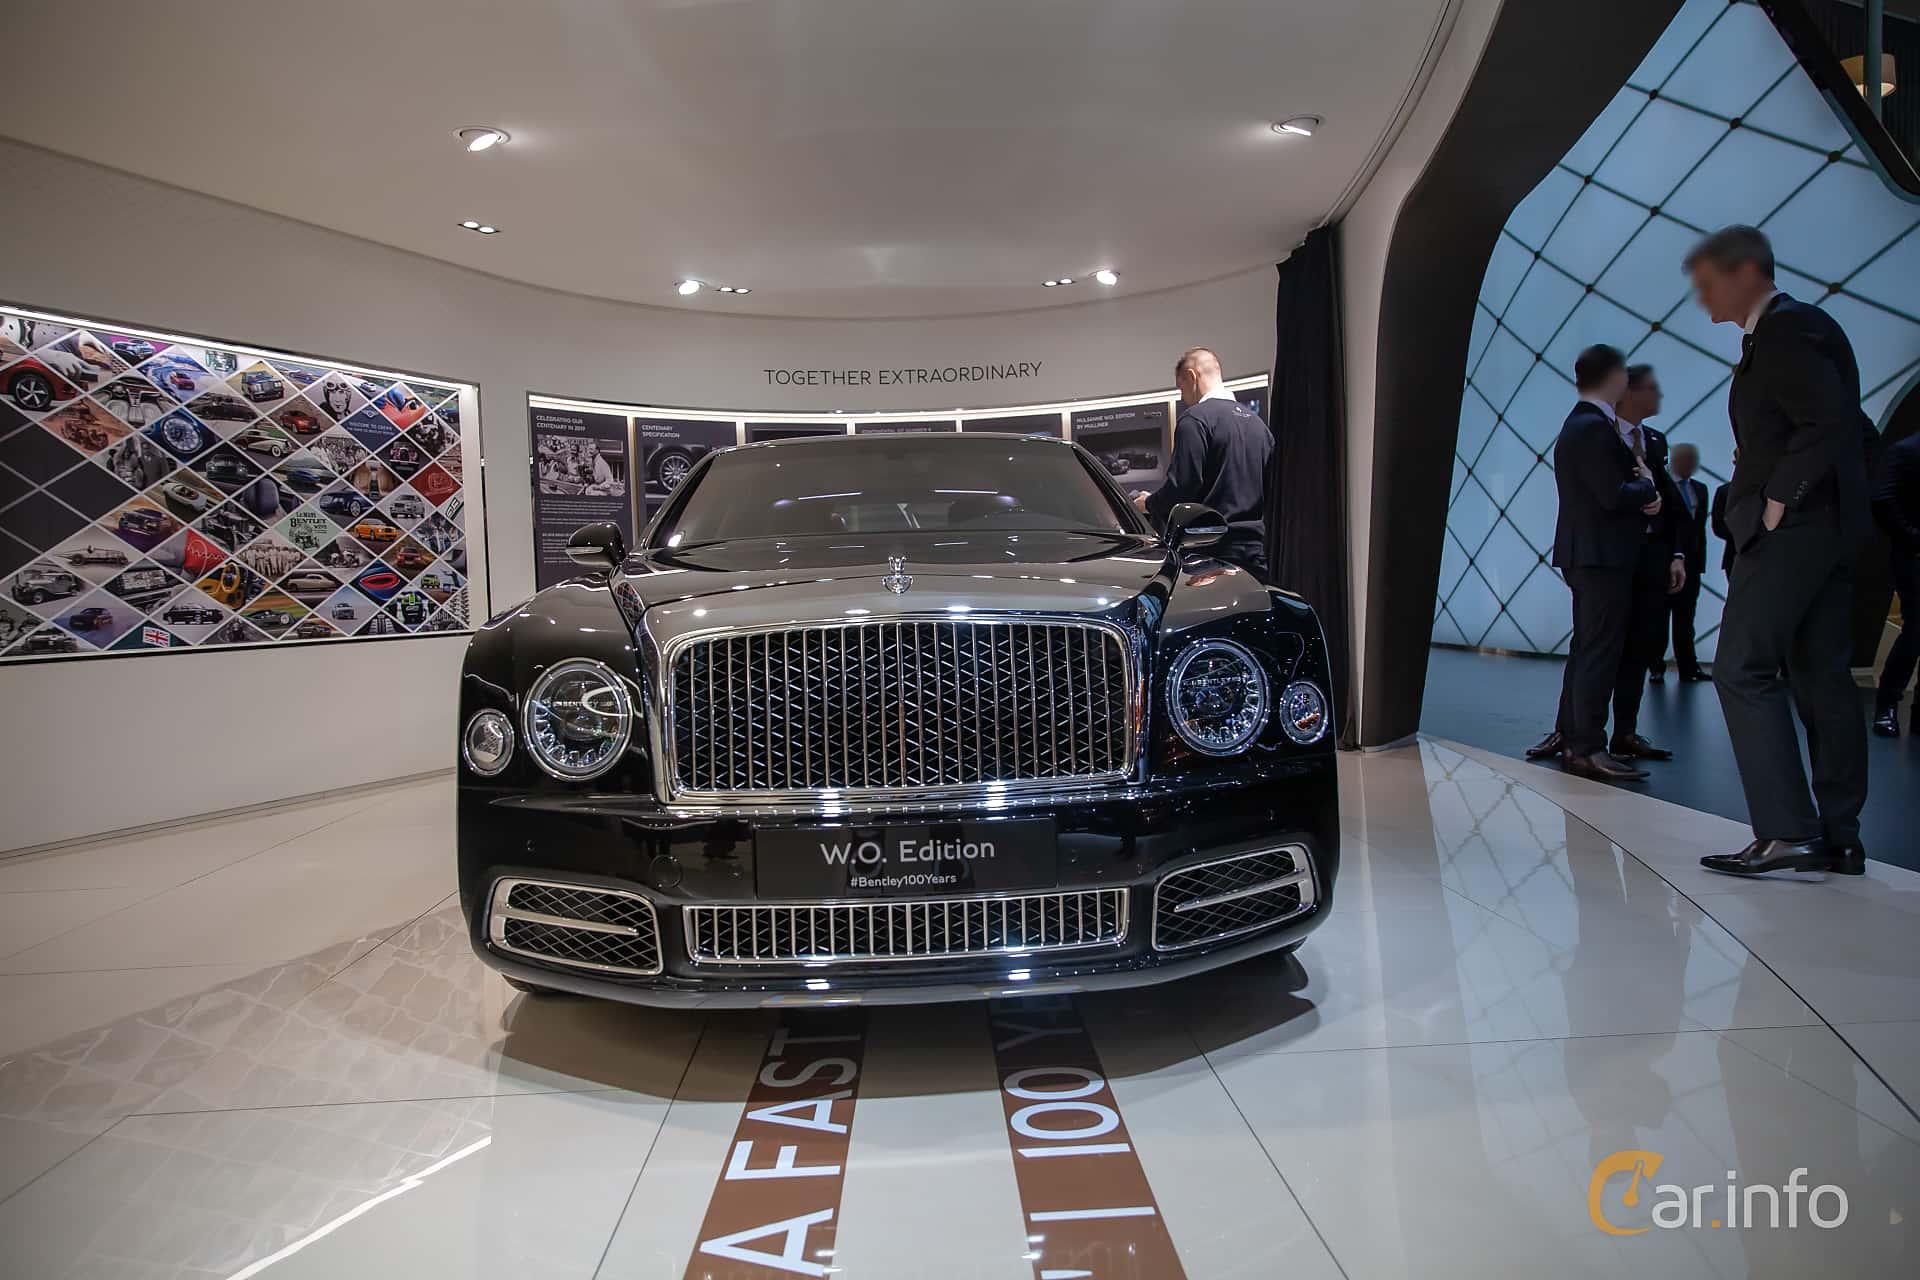 Bentley Mulsanne 6.75 V8  Automatic, 512hp, 2019 at Geneva Motor Show 2019